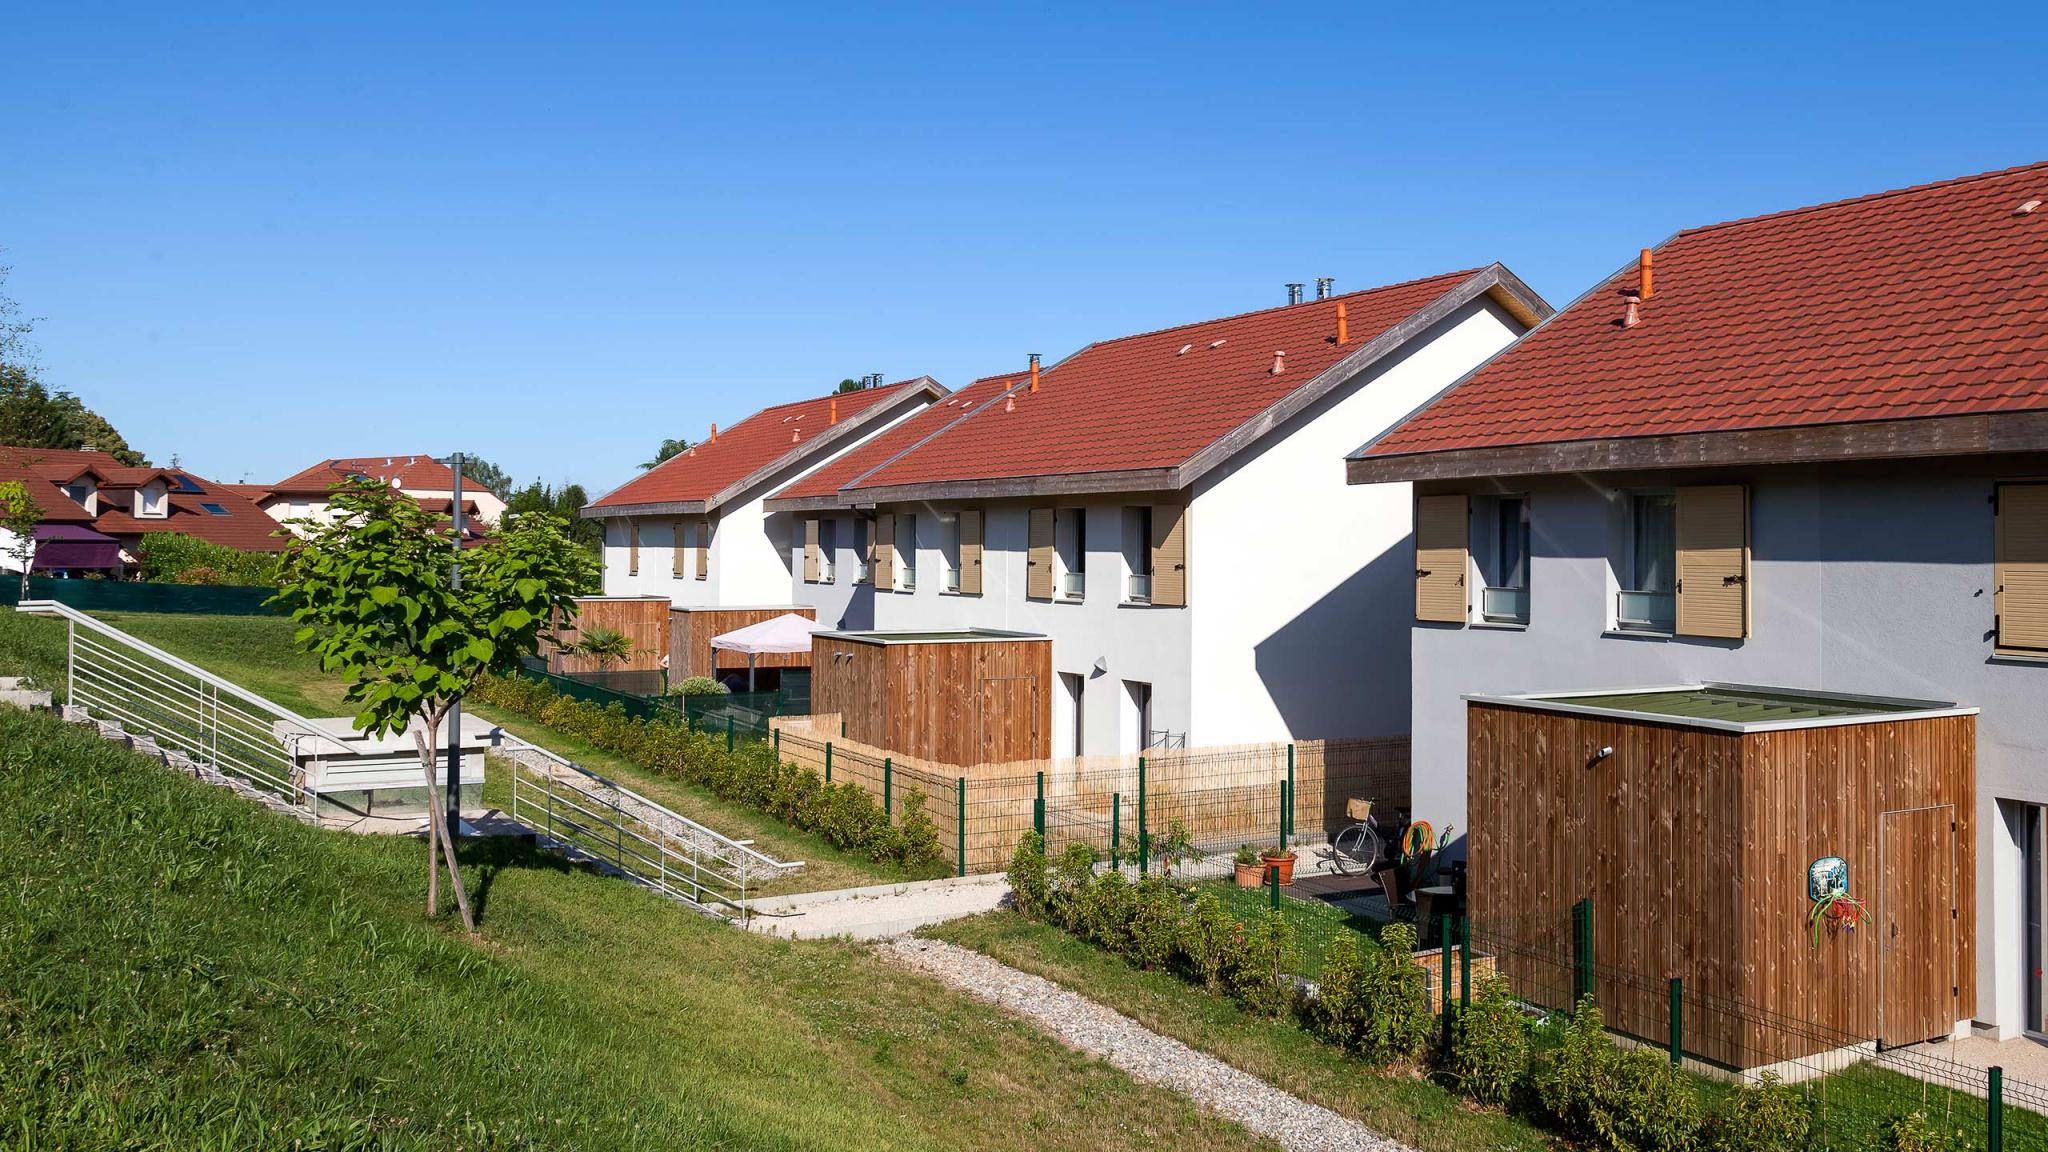 Chevry Saint-Genis programme immobilier neuf